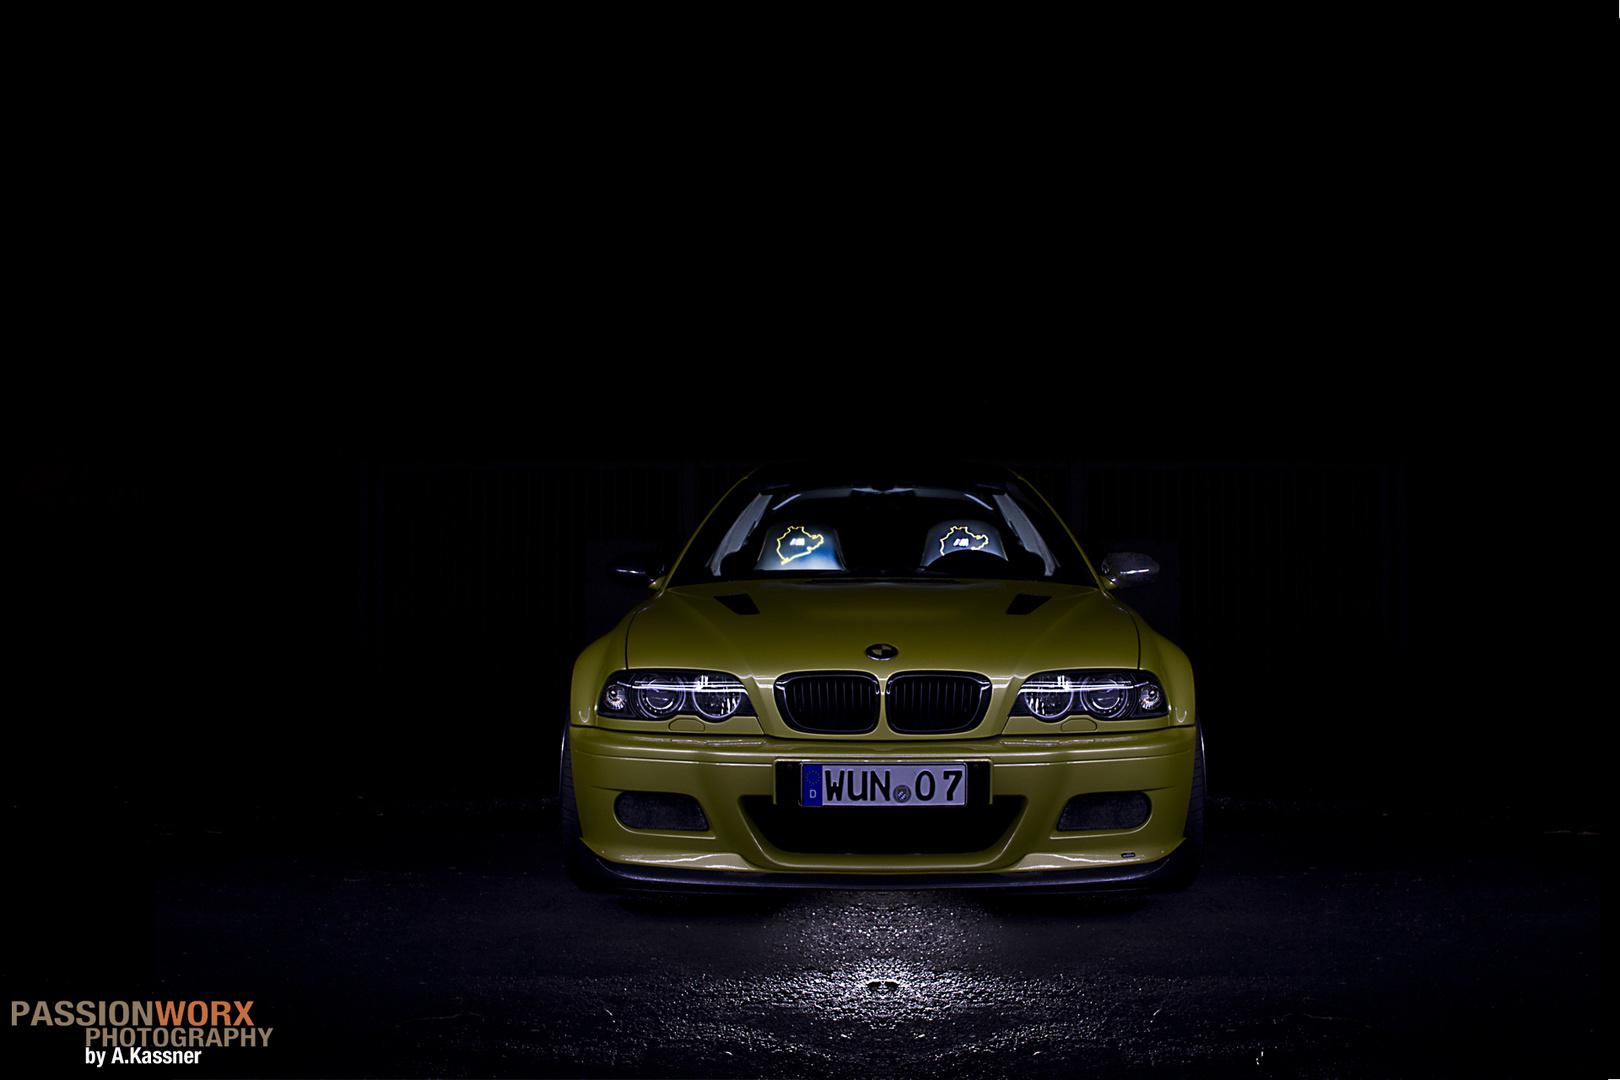 BMW M3 E46 Frontansicht